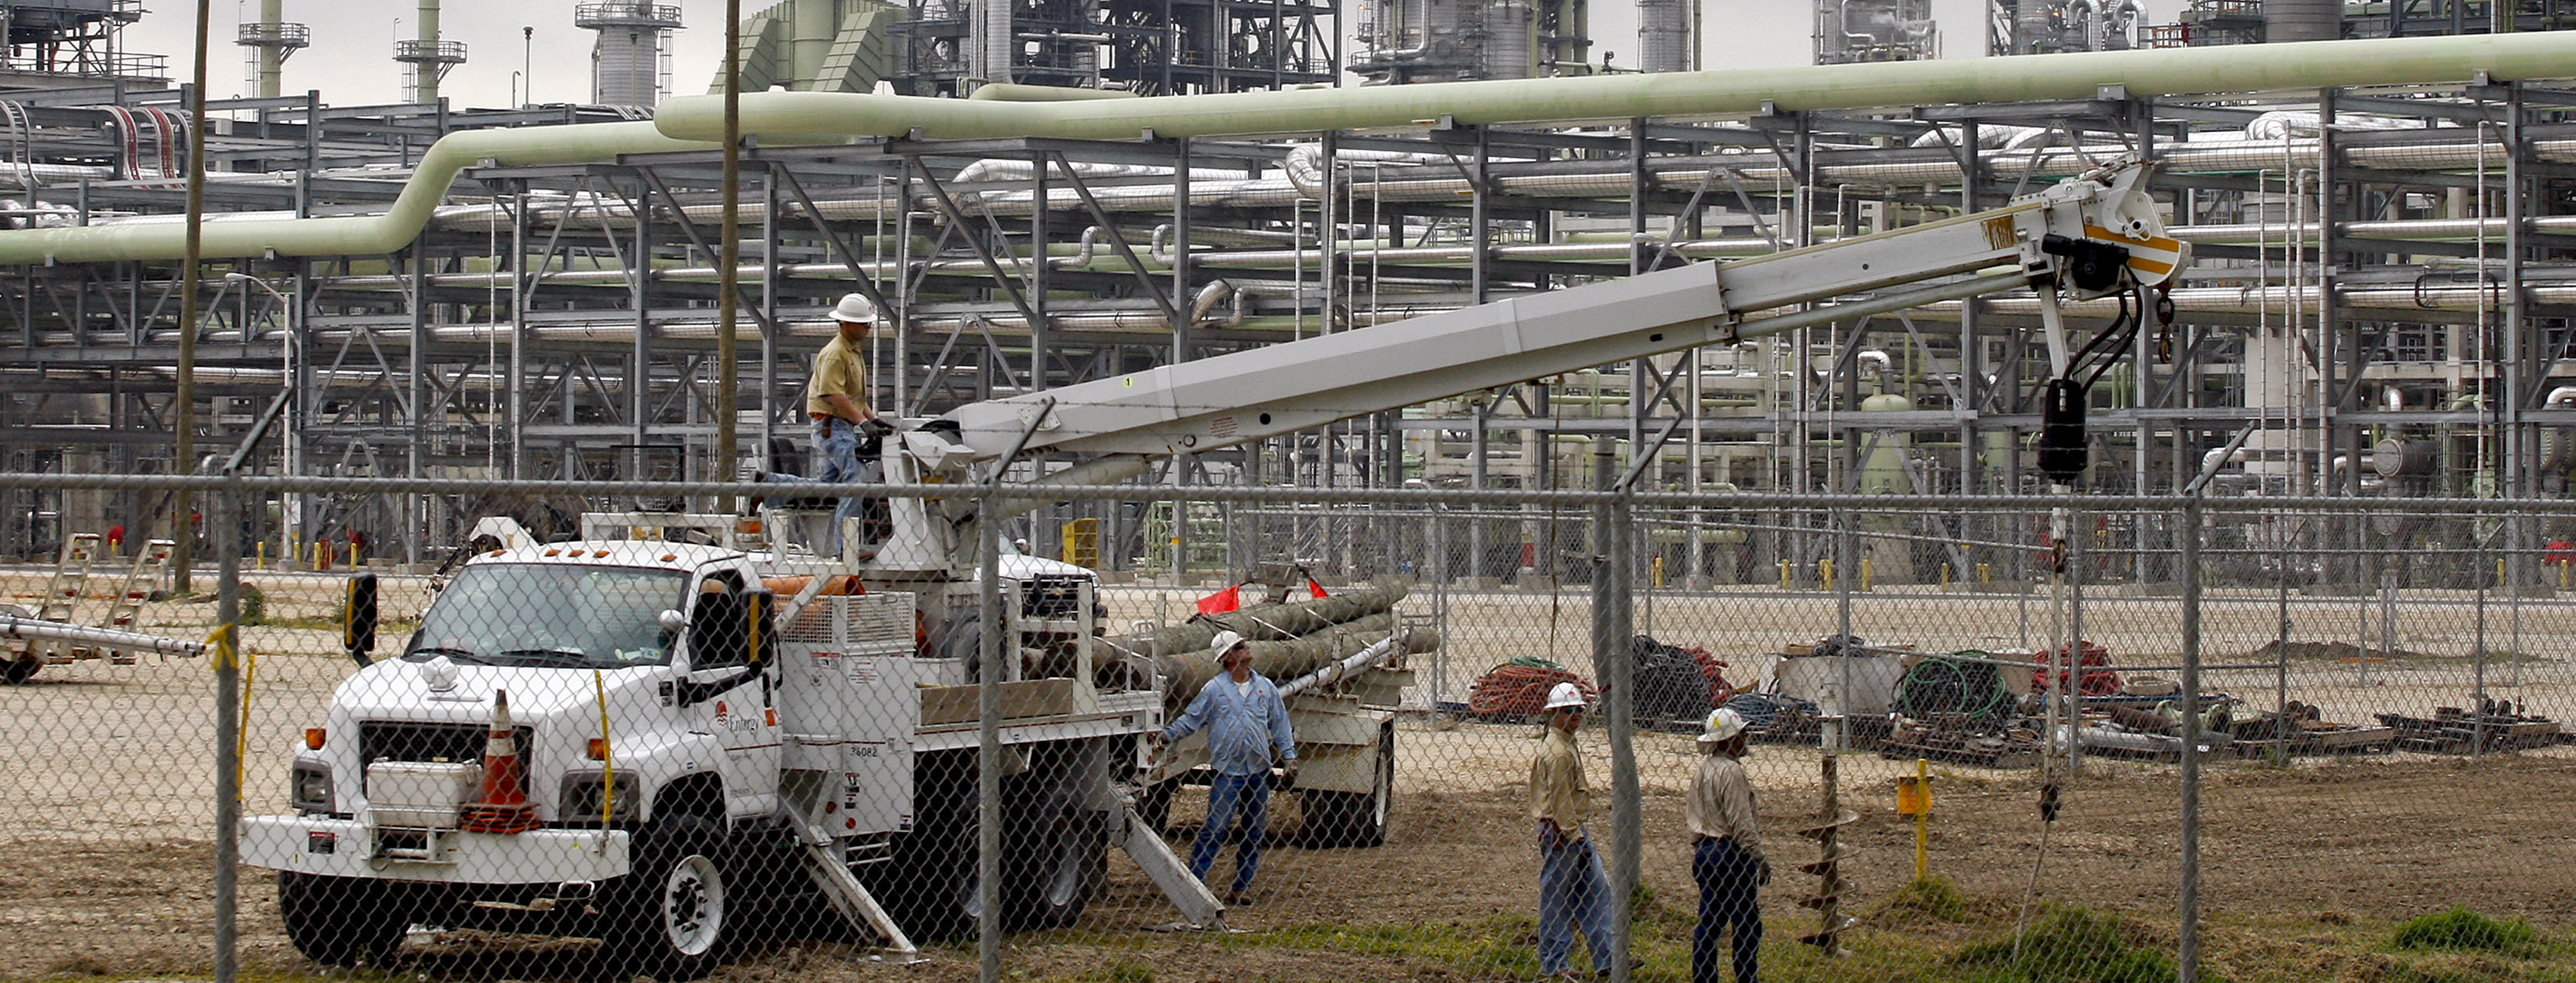 Tour of Marathon Oil Company's Garyville Refinery